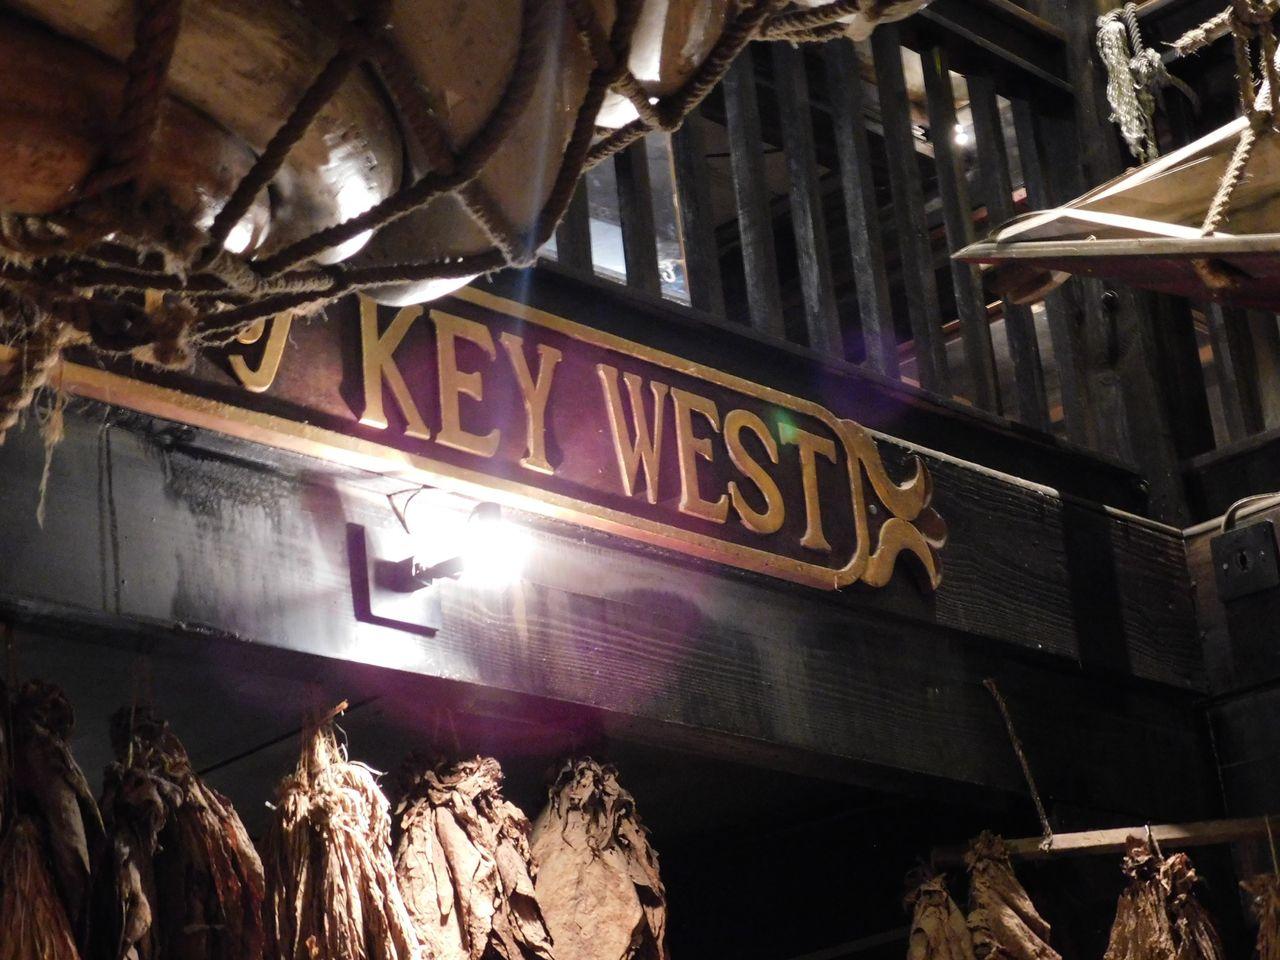 Key West Shipwreck Treasure Museum